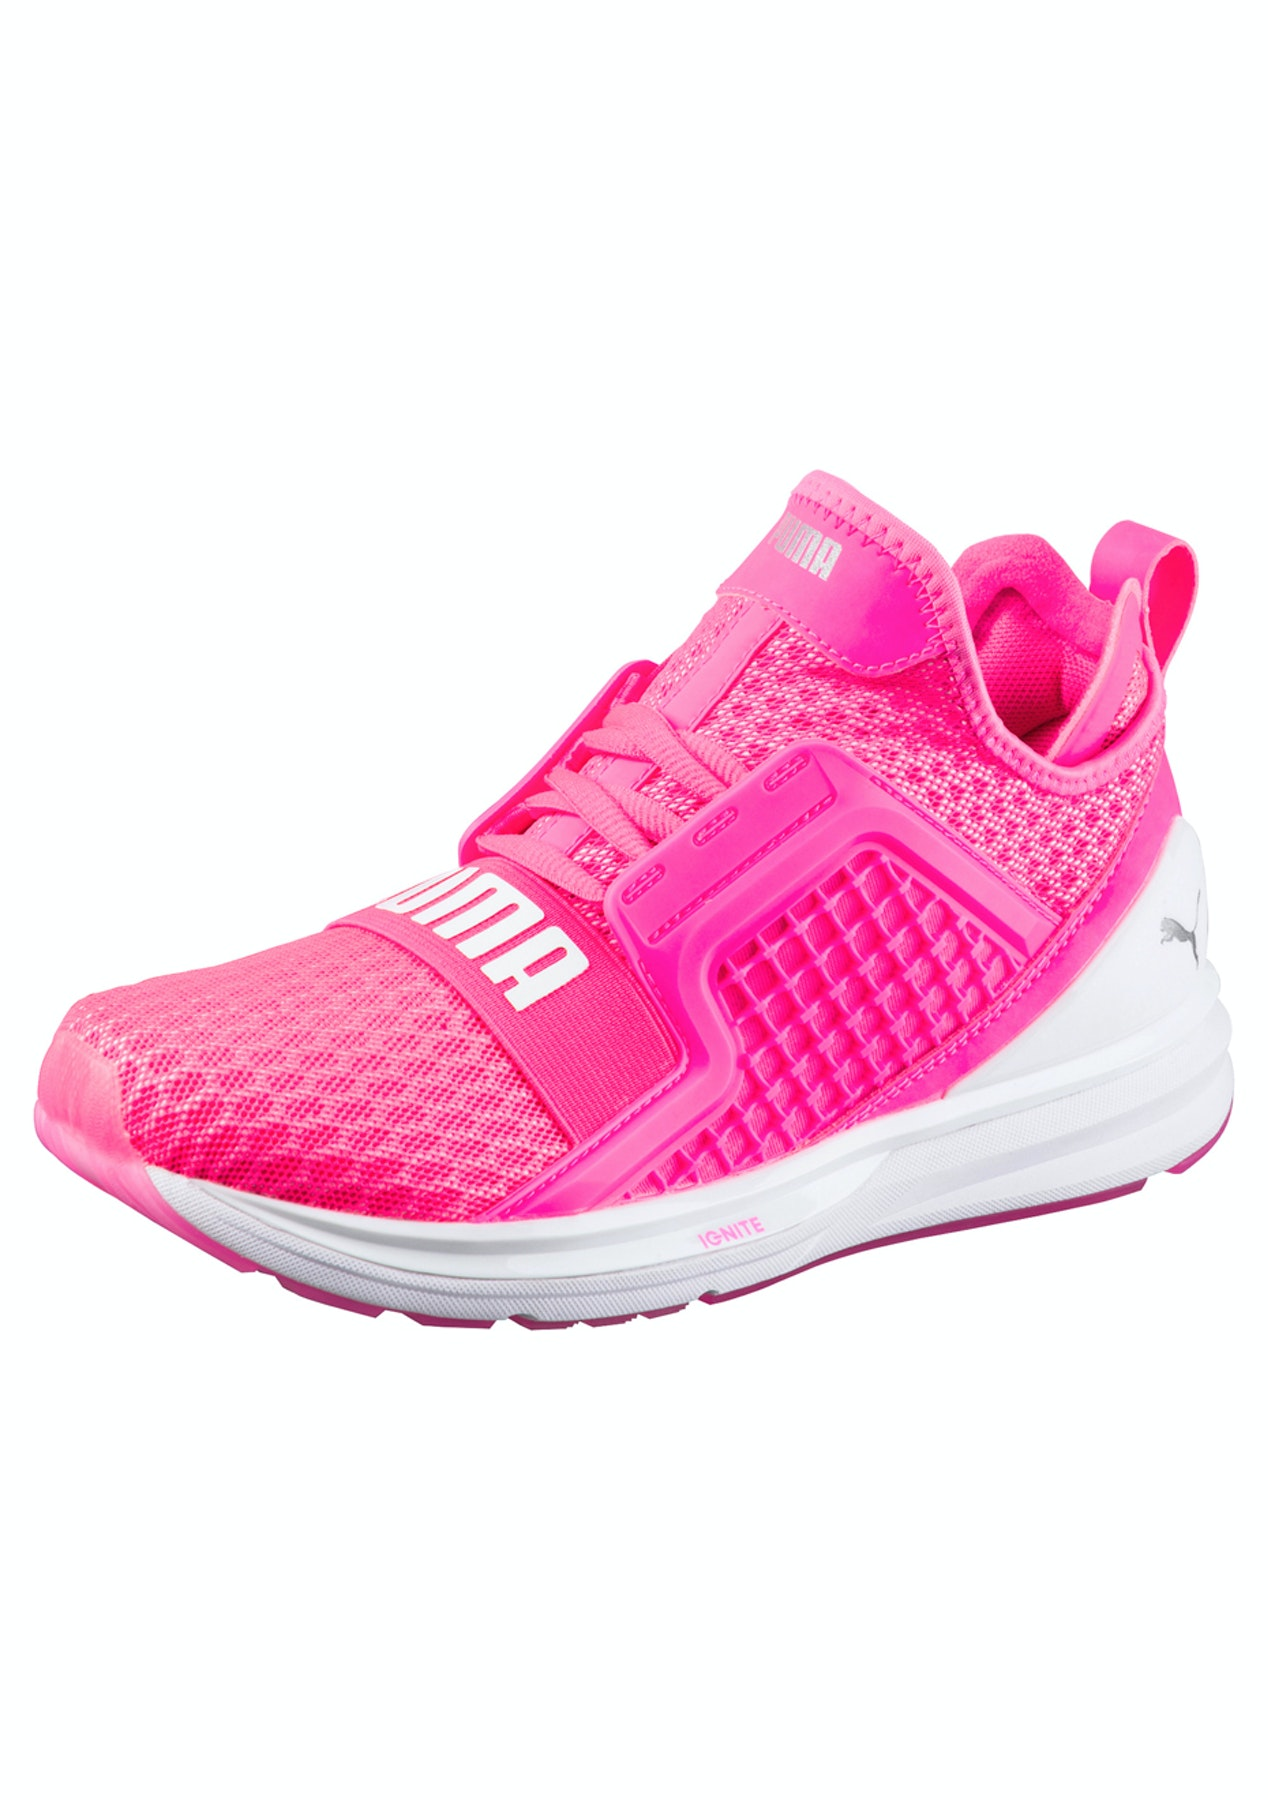 5fddb7ac358 Puma Womens - Ignite Limitless Pink - Womens Garage Sale - Onceit